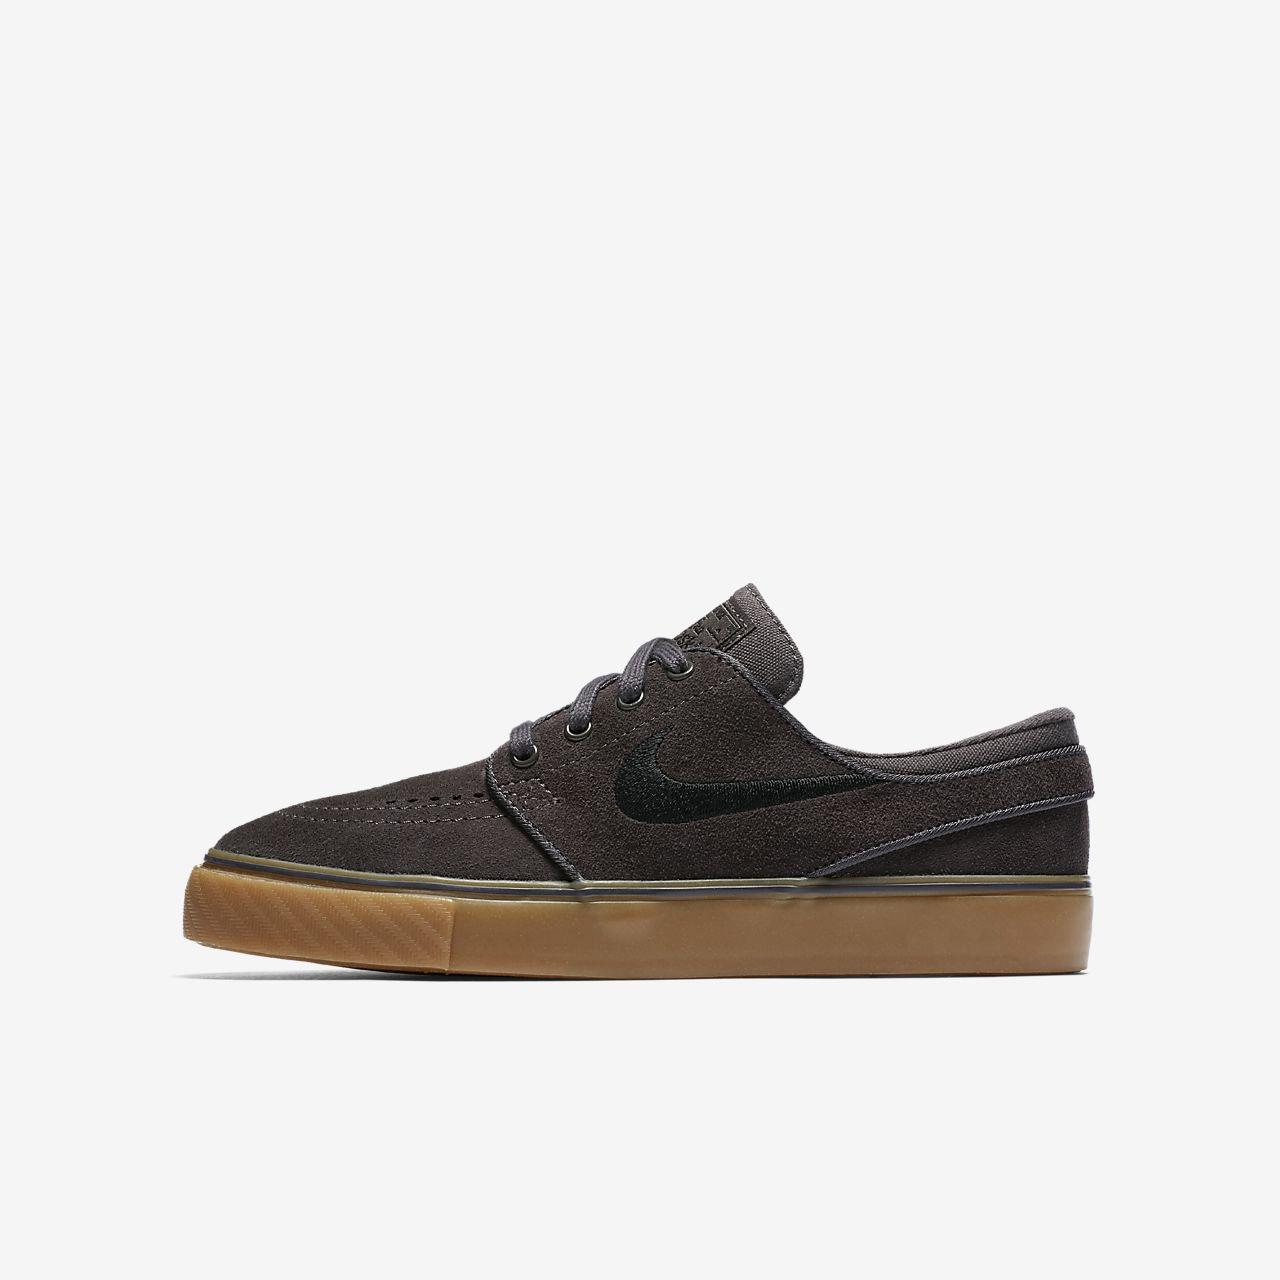 Nike Zoom Stefan Janoski Sabatilles de skateboard - Nen/a